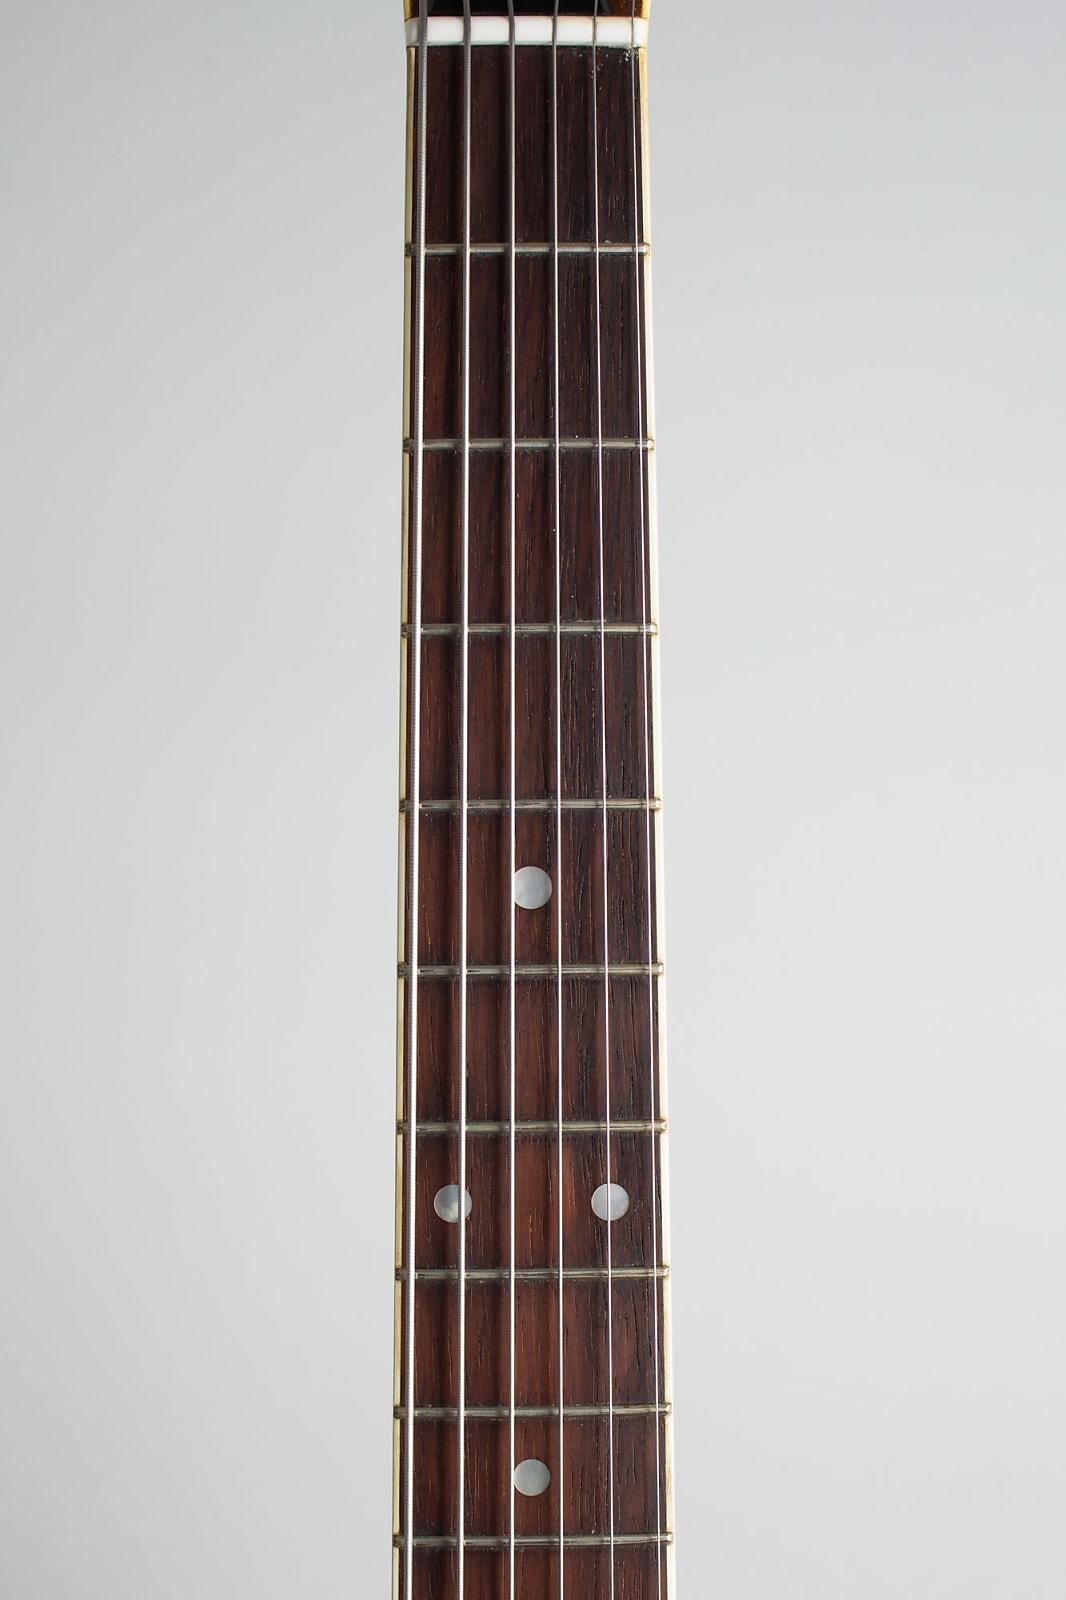 C. F. Martin  GT-75 Thinline Hollow Body Electric Guitar (1967), ser. #218537, original black hard shell case.